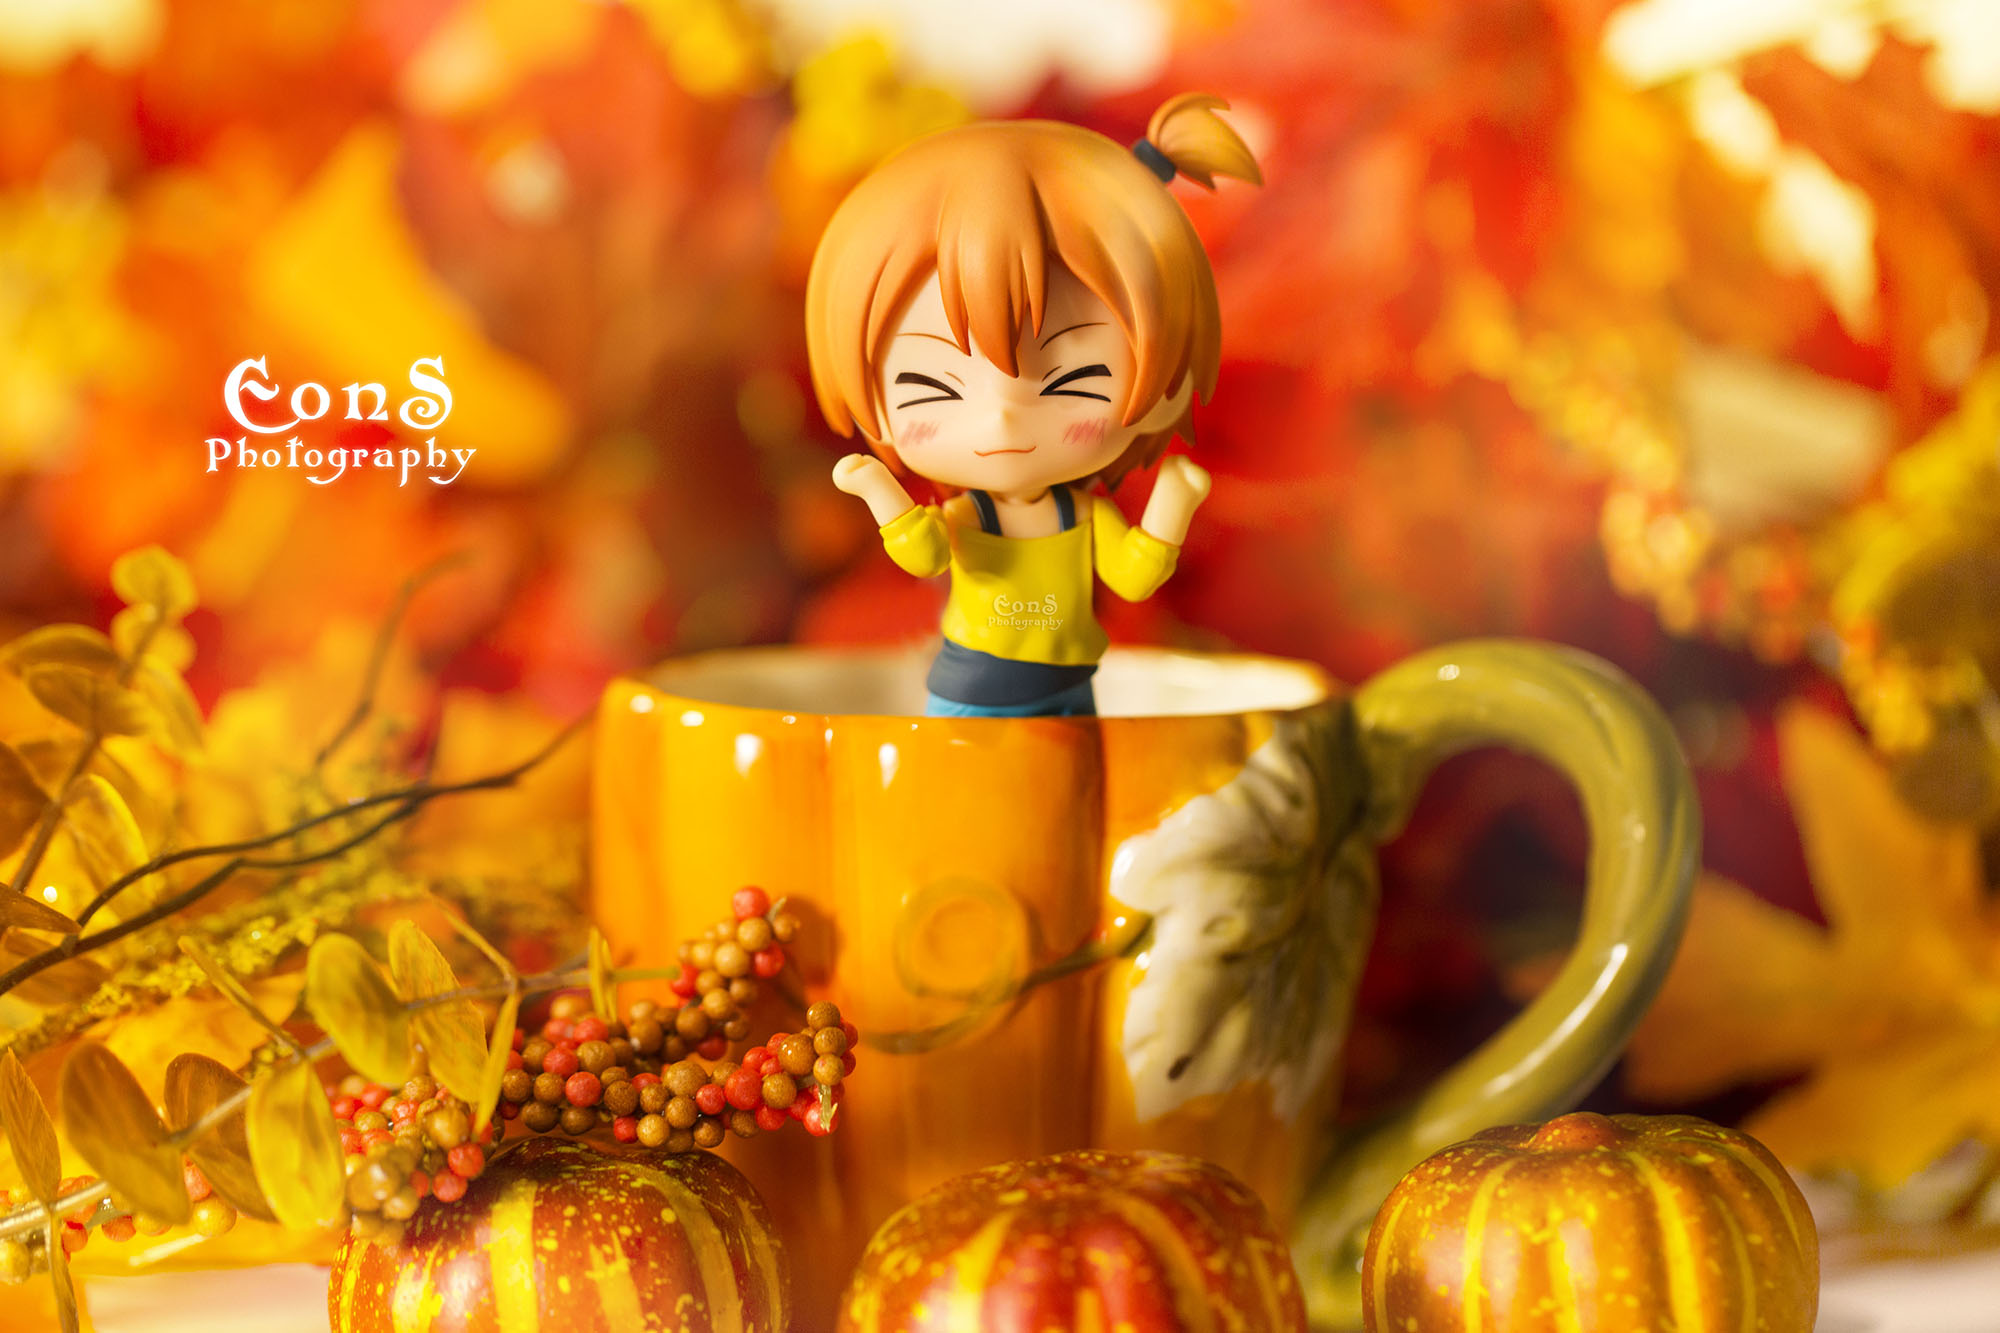 nendoroid good_smile_company nendoron love_live!_school_idol_project hoshizora_rin shichibee nd_dog imai_yuuichi